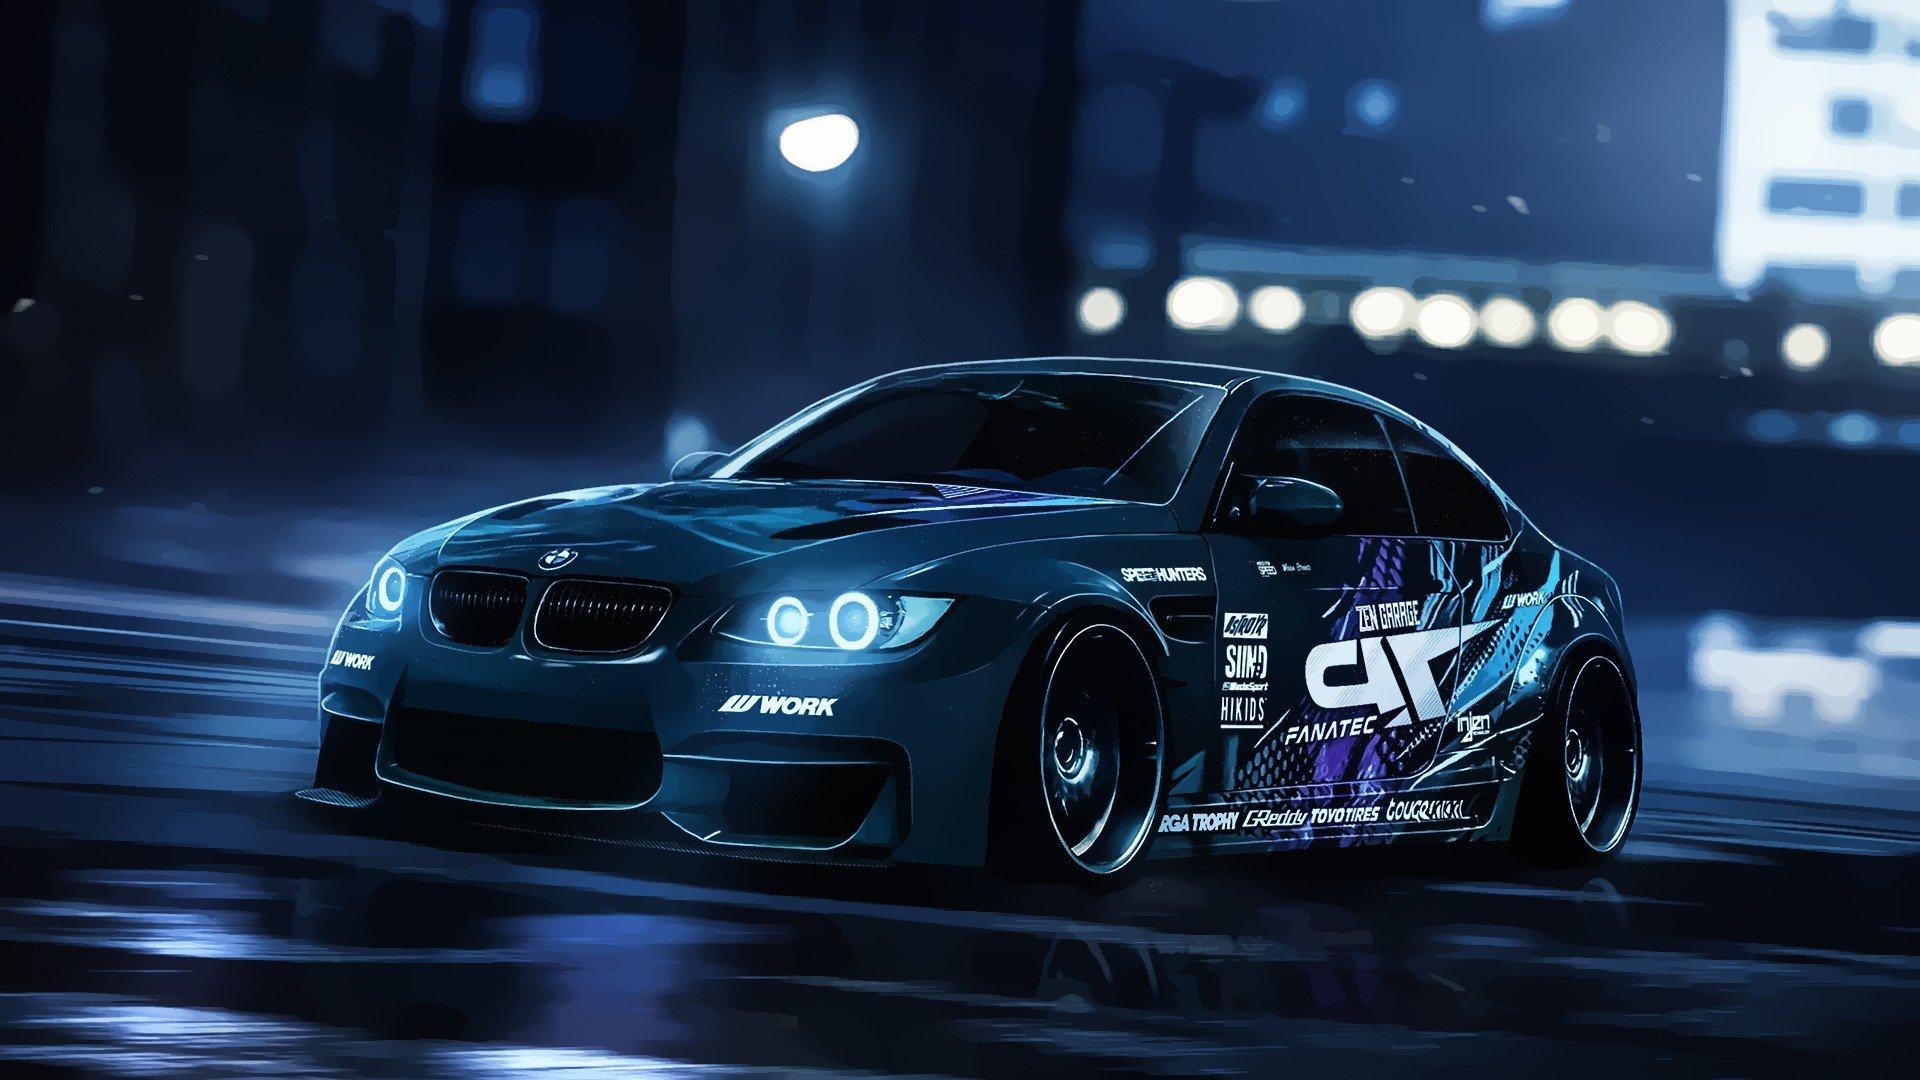 Wallpaper : 1920x1080 px, BMW E92 M3, car, vector ...